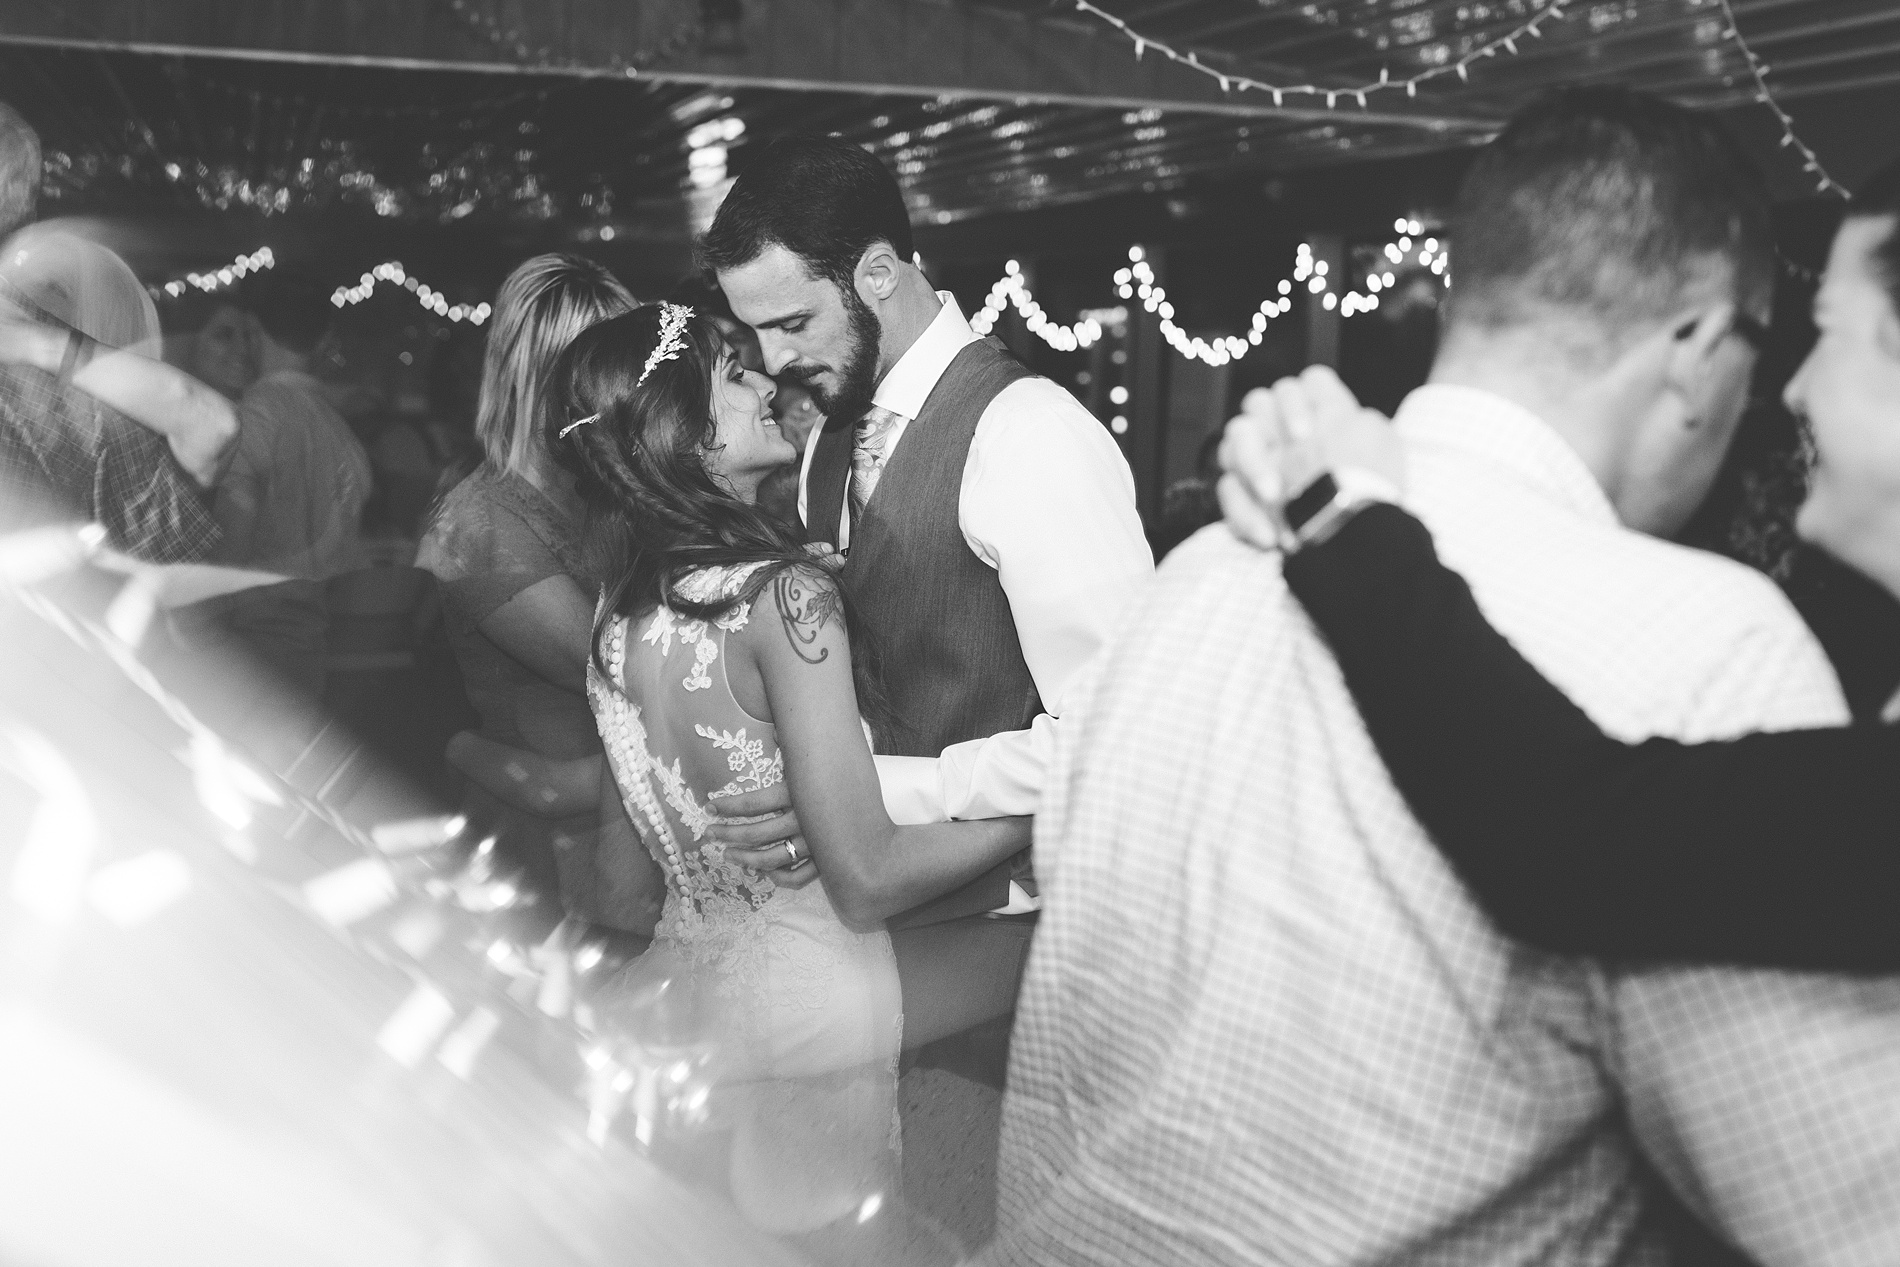 Brandon_Shafer_Photography_Brett_Autumn_Wedding_0061.jpg